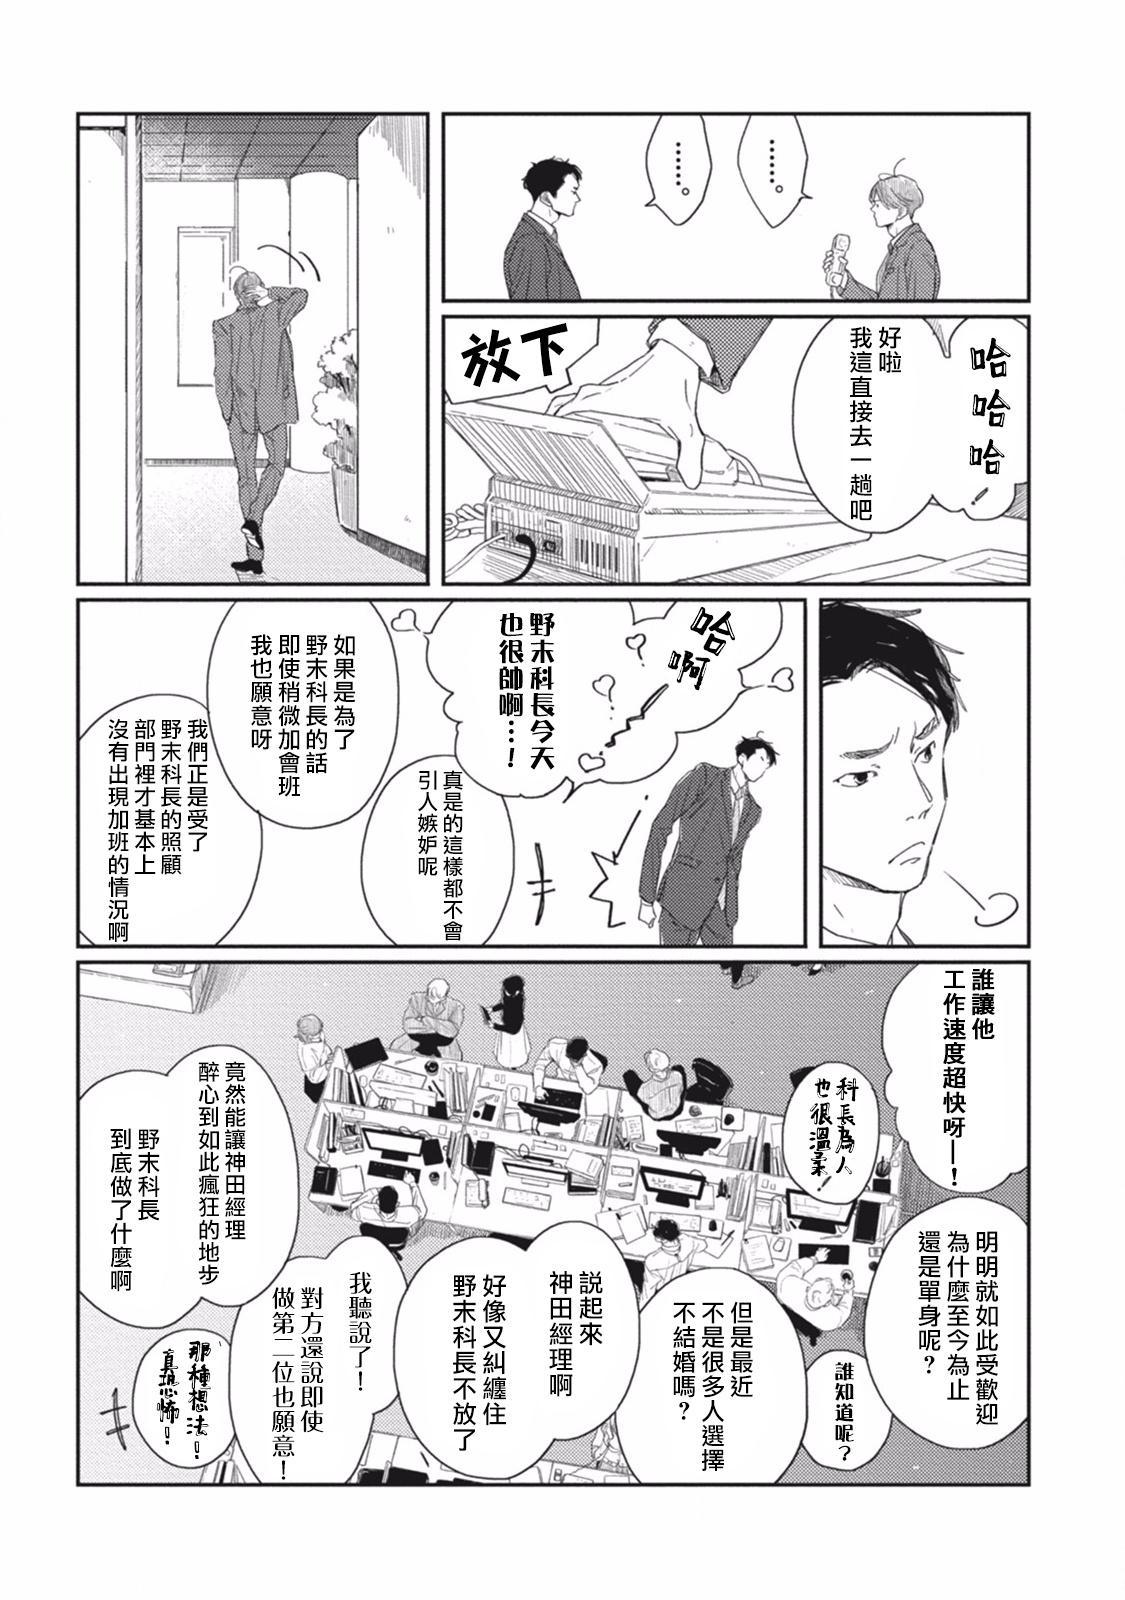 [Sagan Sagan] Old-fashioned Cupcake Ch. 1-2 [Chinese] [拾荒者汉化组] [Digital] 8